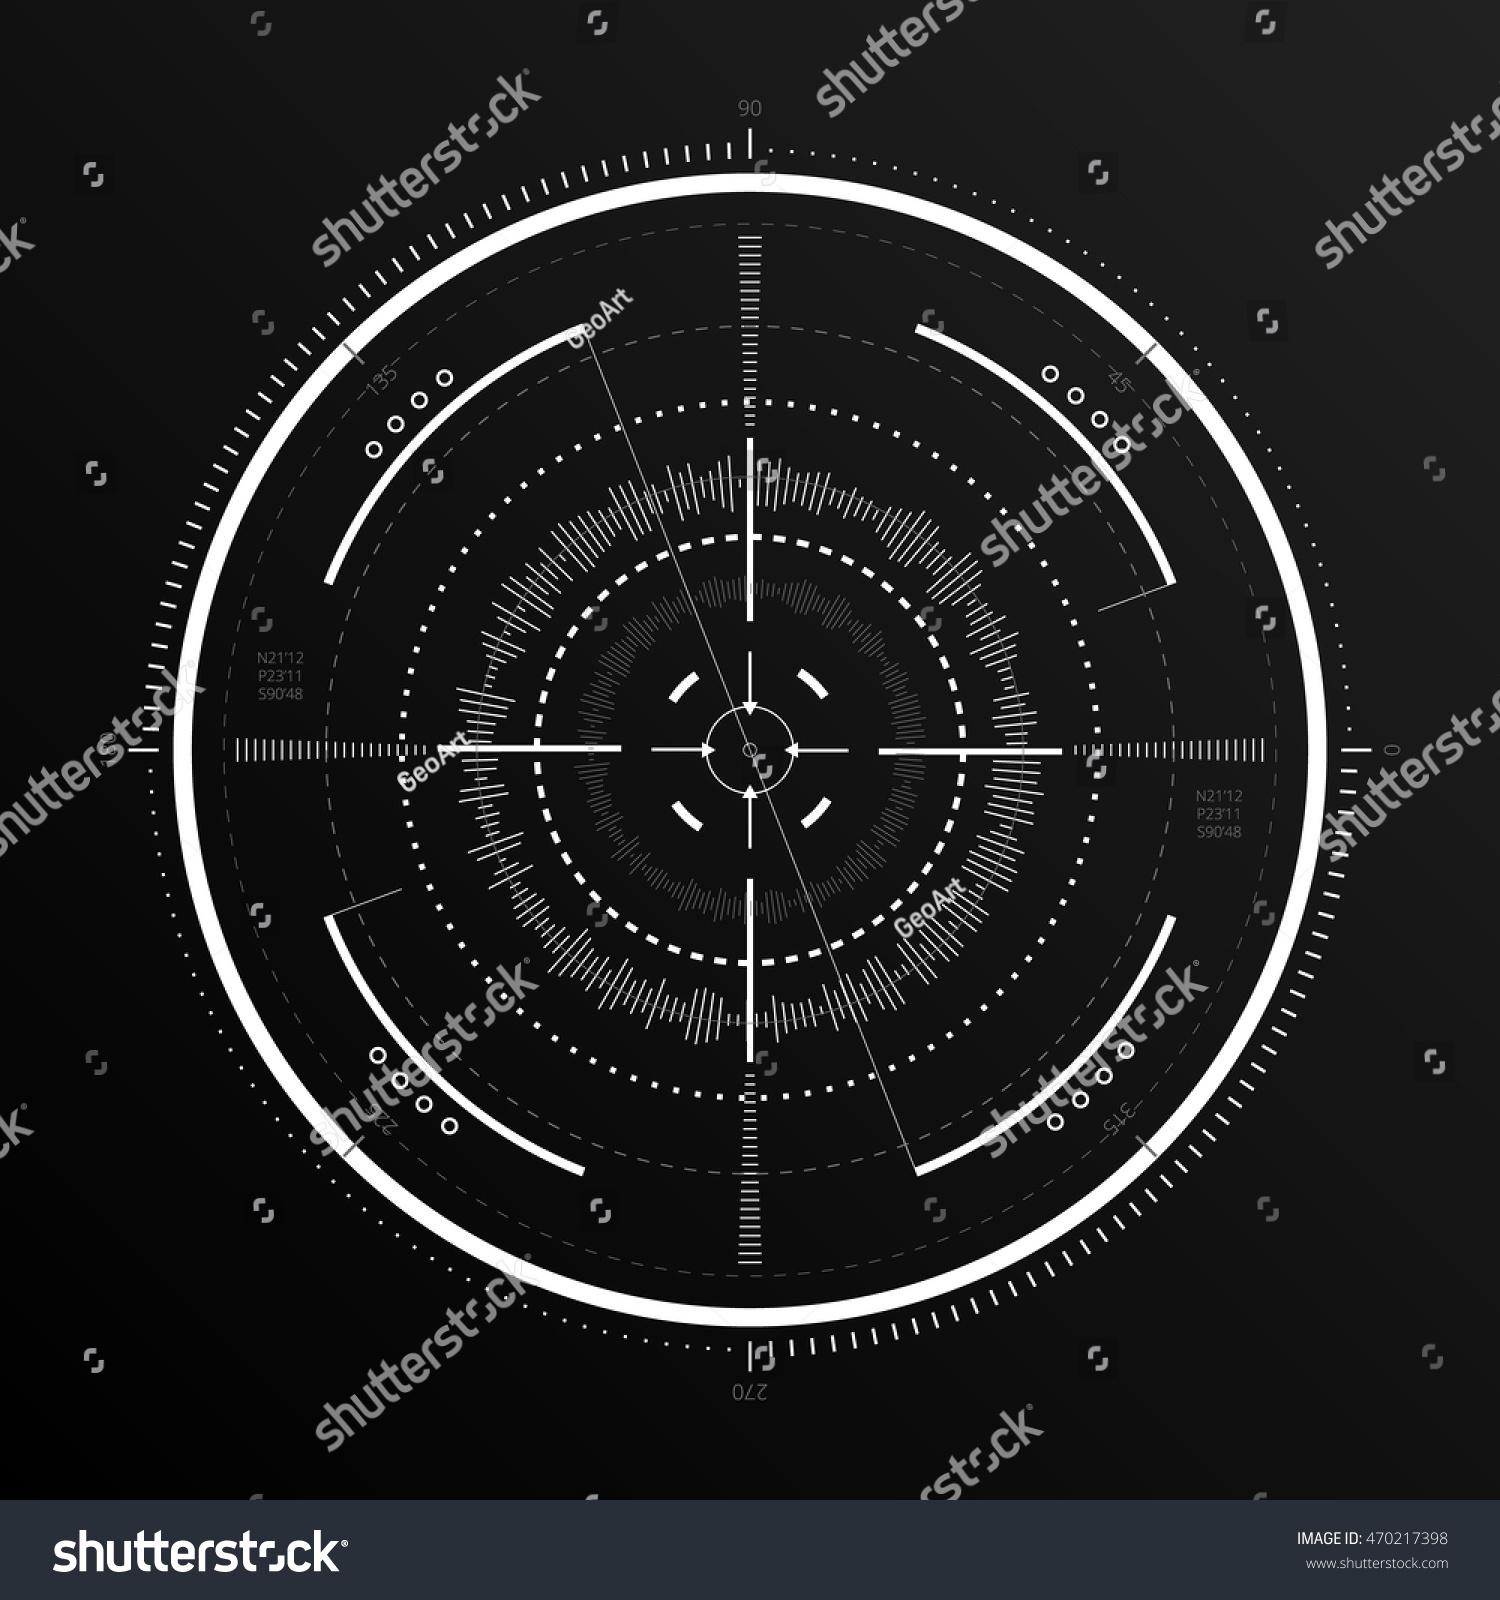 scifi futuristic spaceship crosshair hud user stock vector